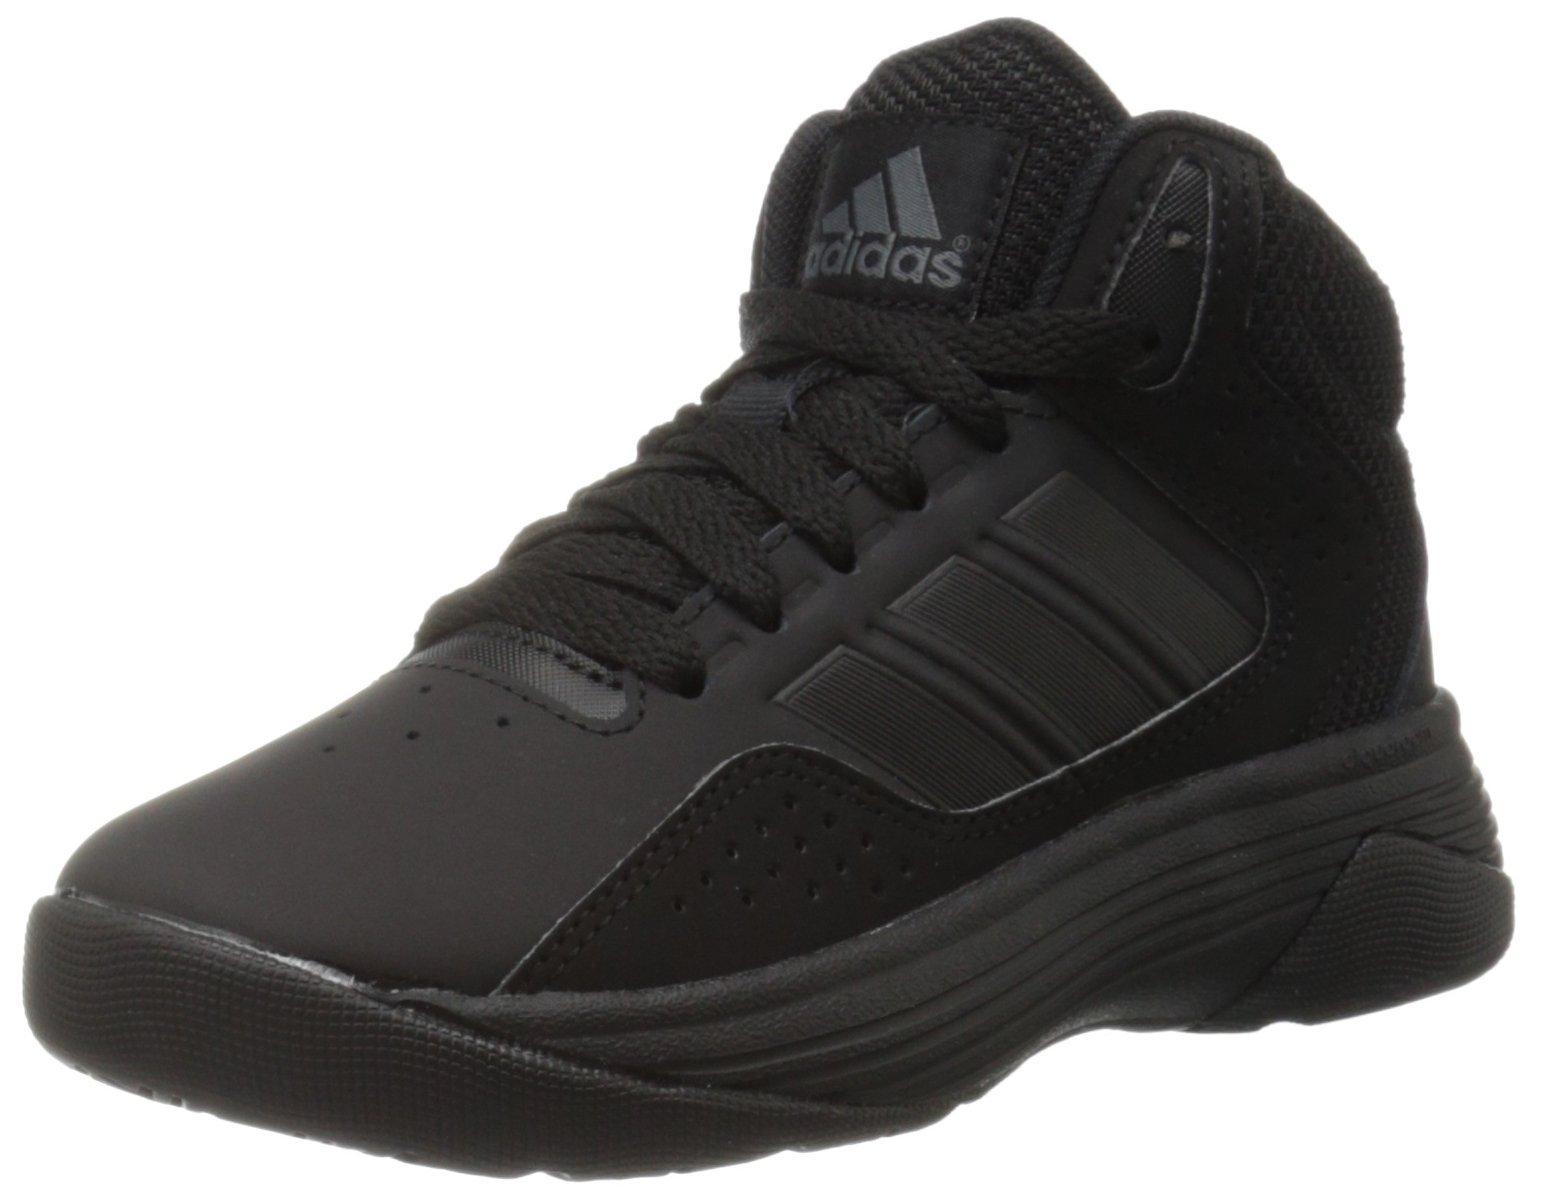 8a686abc662 Galleon - Adidas Performance Boys  Cloudfoam Ilation Mid K Skate Shoe